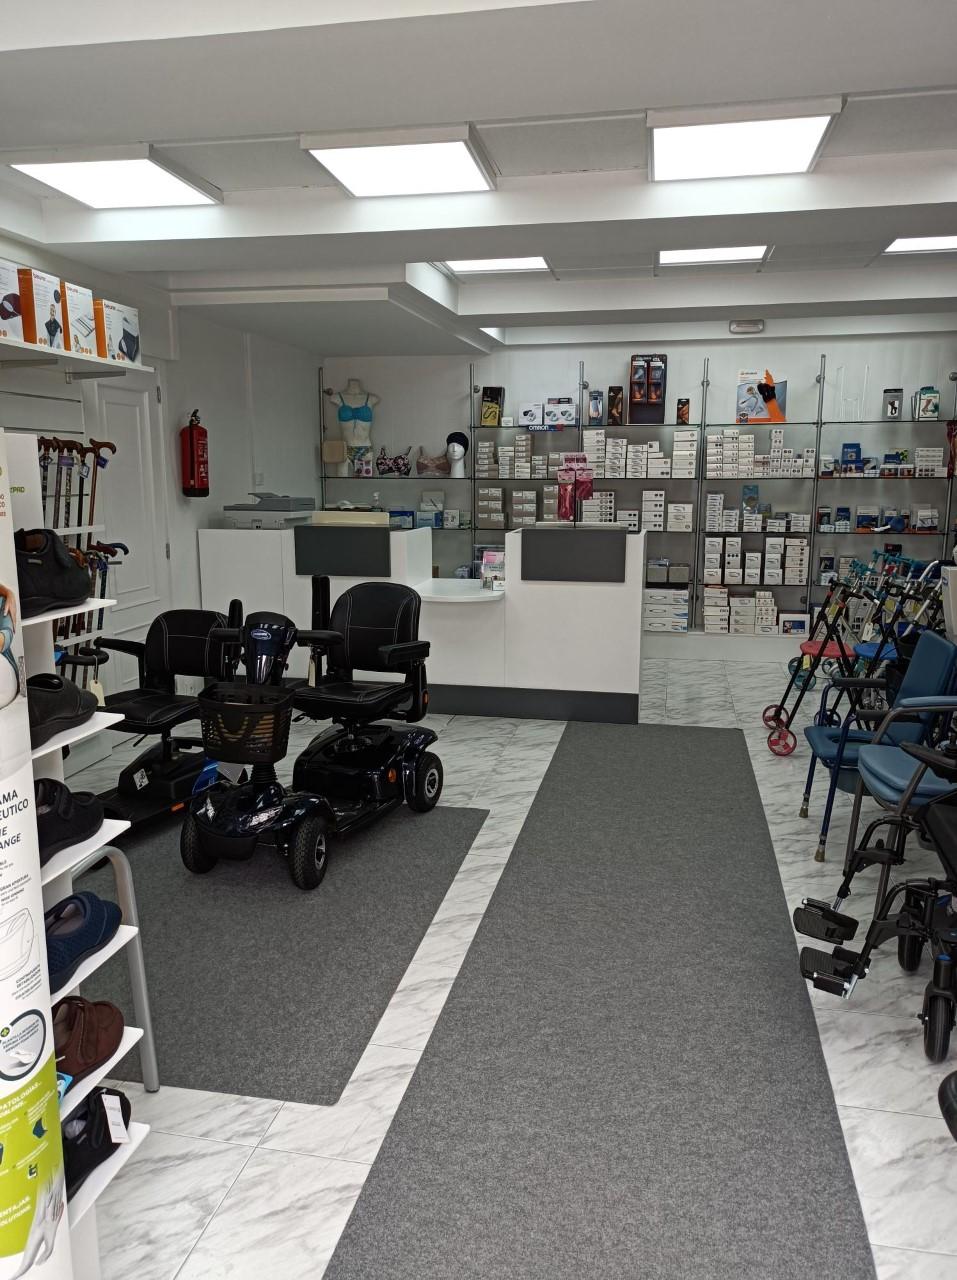 Centro ortopédico en Cangas, Mendez Nuñez 28-30